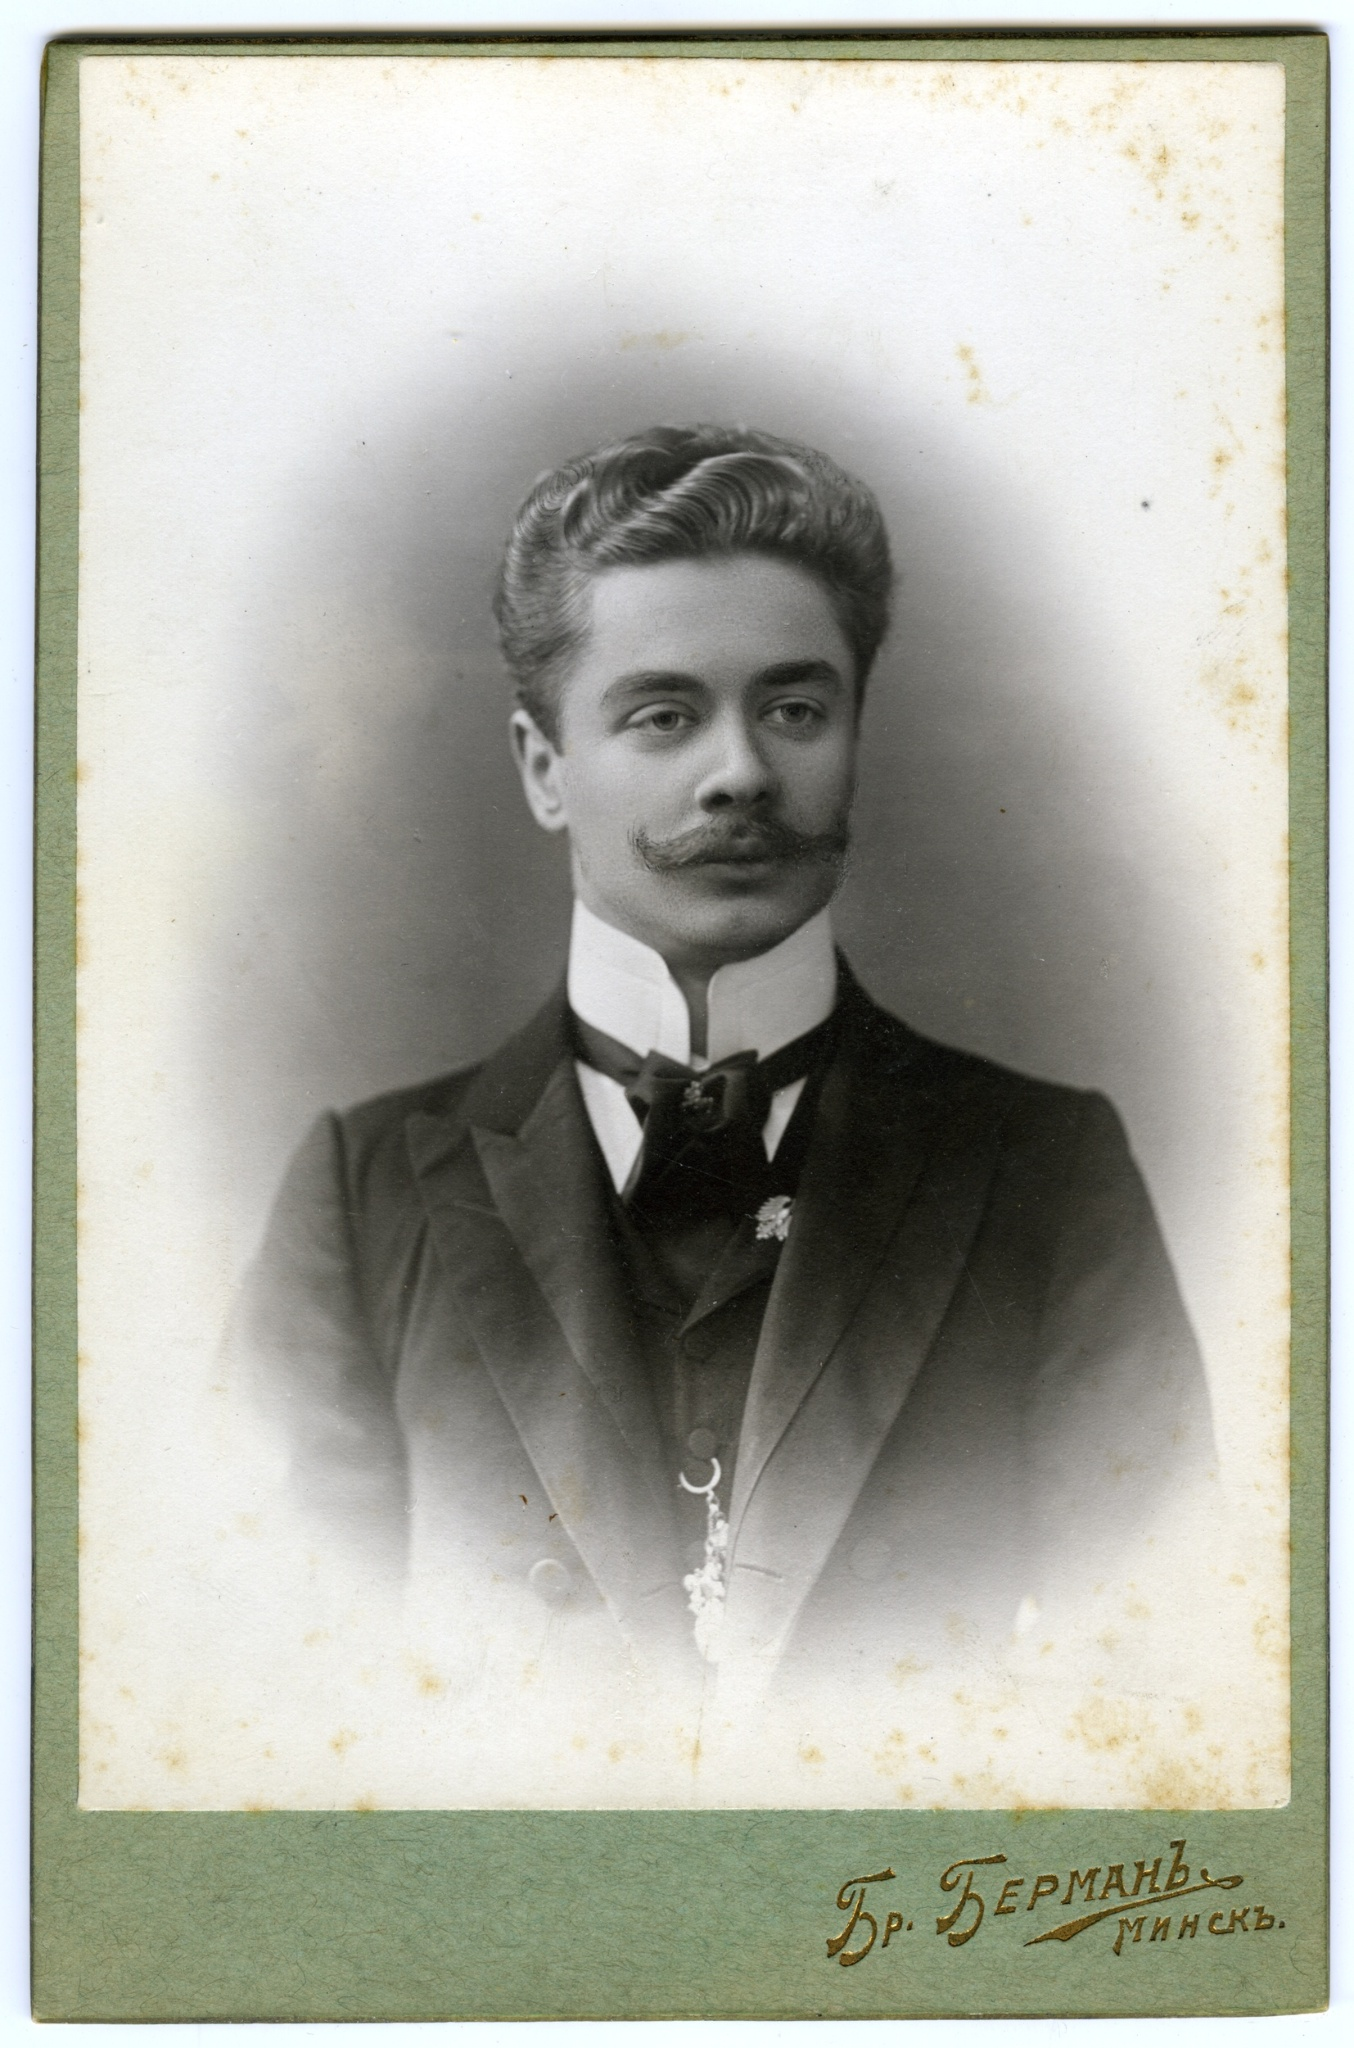 <div class='inner-box'><div class='close-desc'></div><span class='opis'>Ignacy Giedroyć, ojciec Jerzego Giedroycia. Mińsk, zdjęcie z lat 1900-1920</span><div class='clearfix'></div><span>Sygn. FIL03457</span><div class='clearfix'></div><span class='autor'>fot. B. Berman</span><div class='clearfix'></div><span>&copy;B. Berman</span></div>